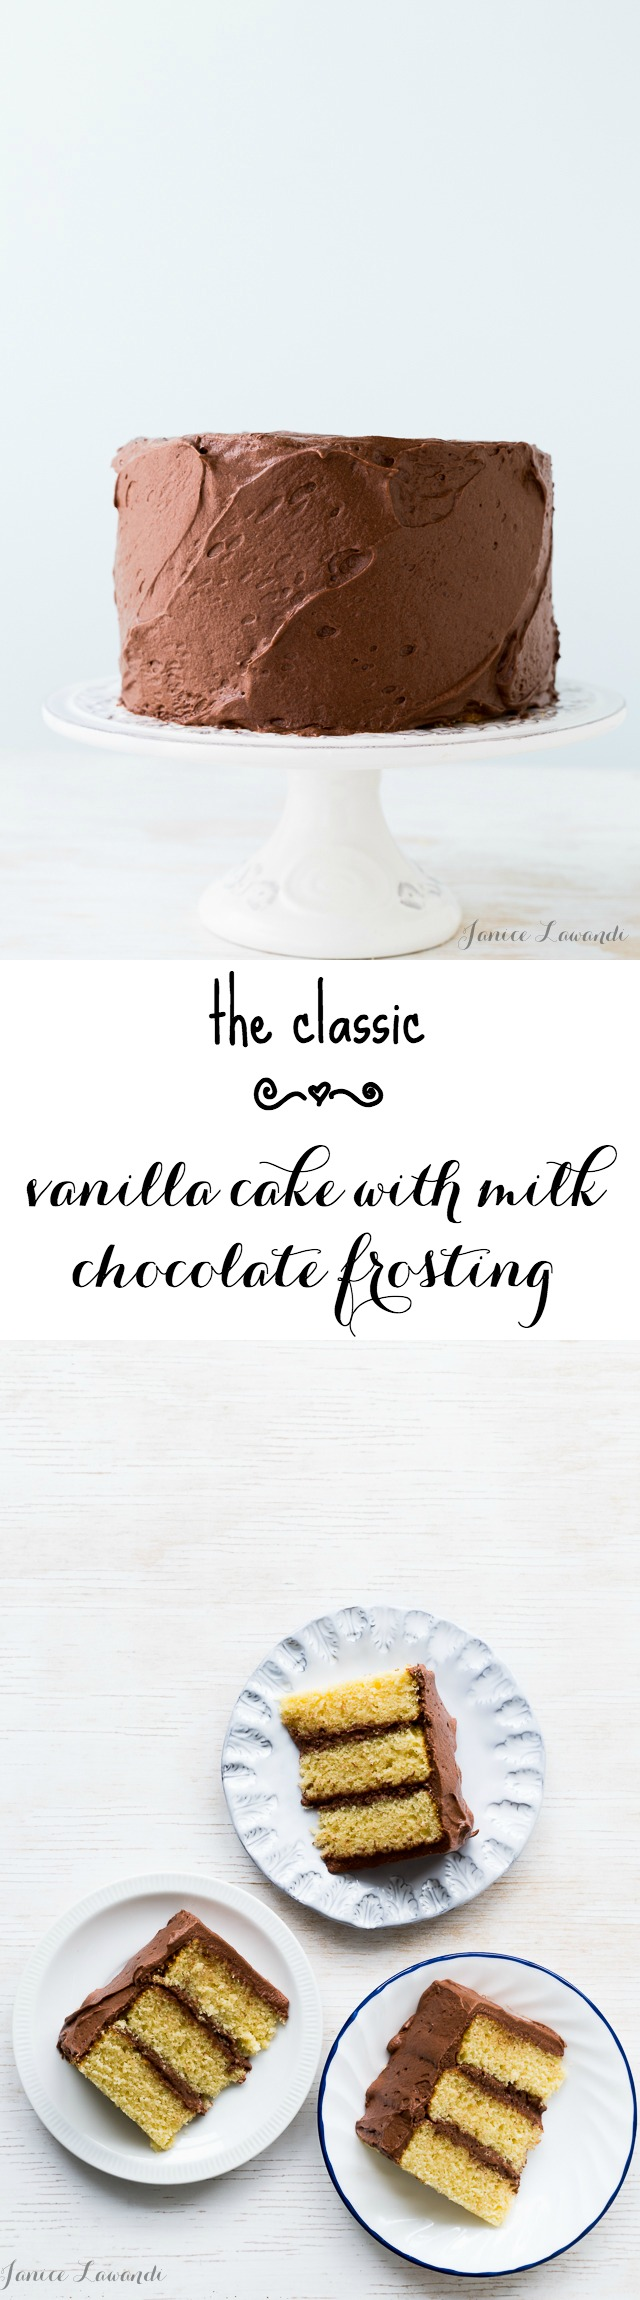 Vanilla cake with milk chocolate frosting